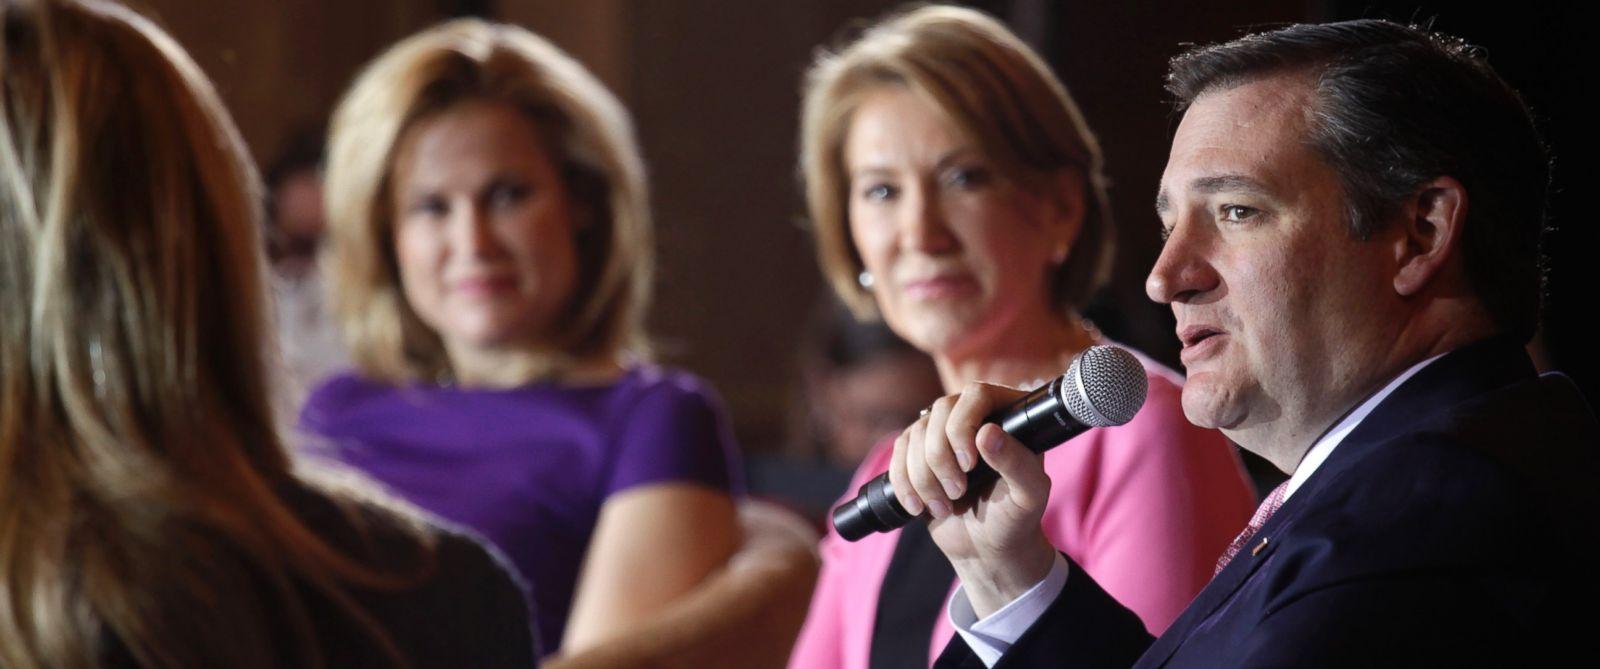 Women Vice President Clip Art